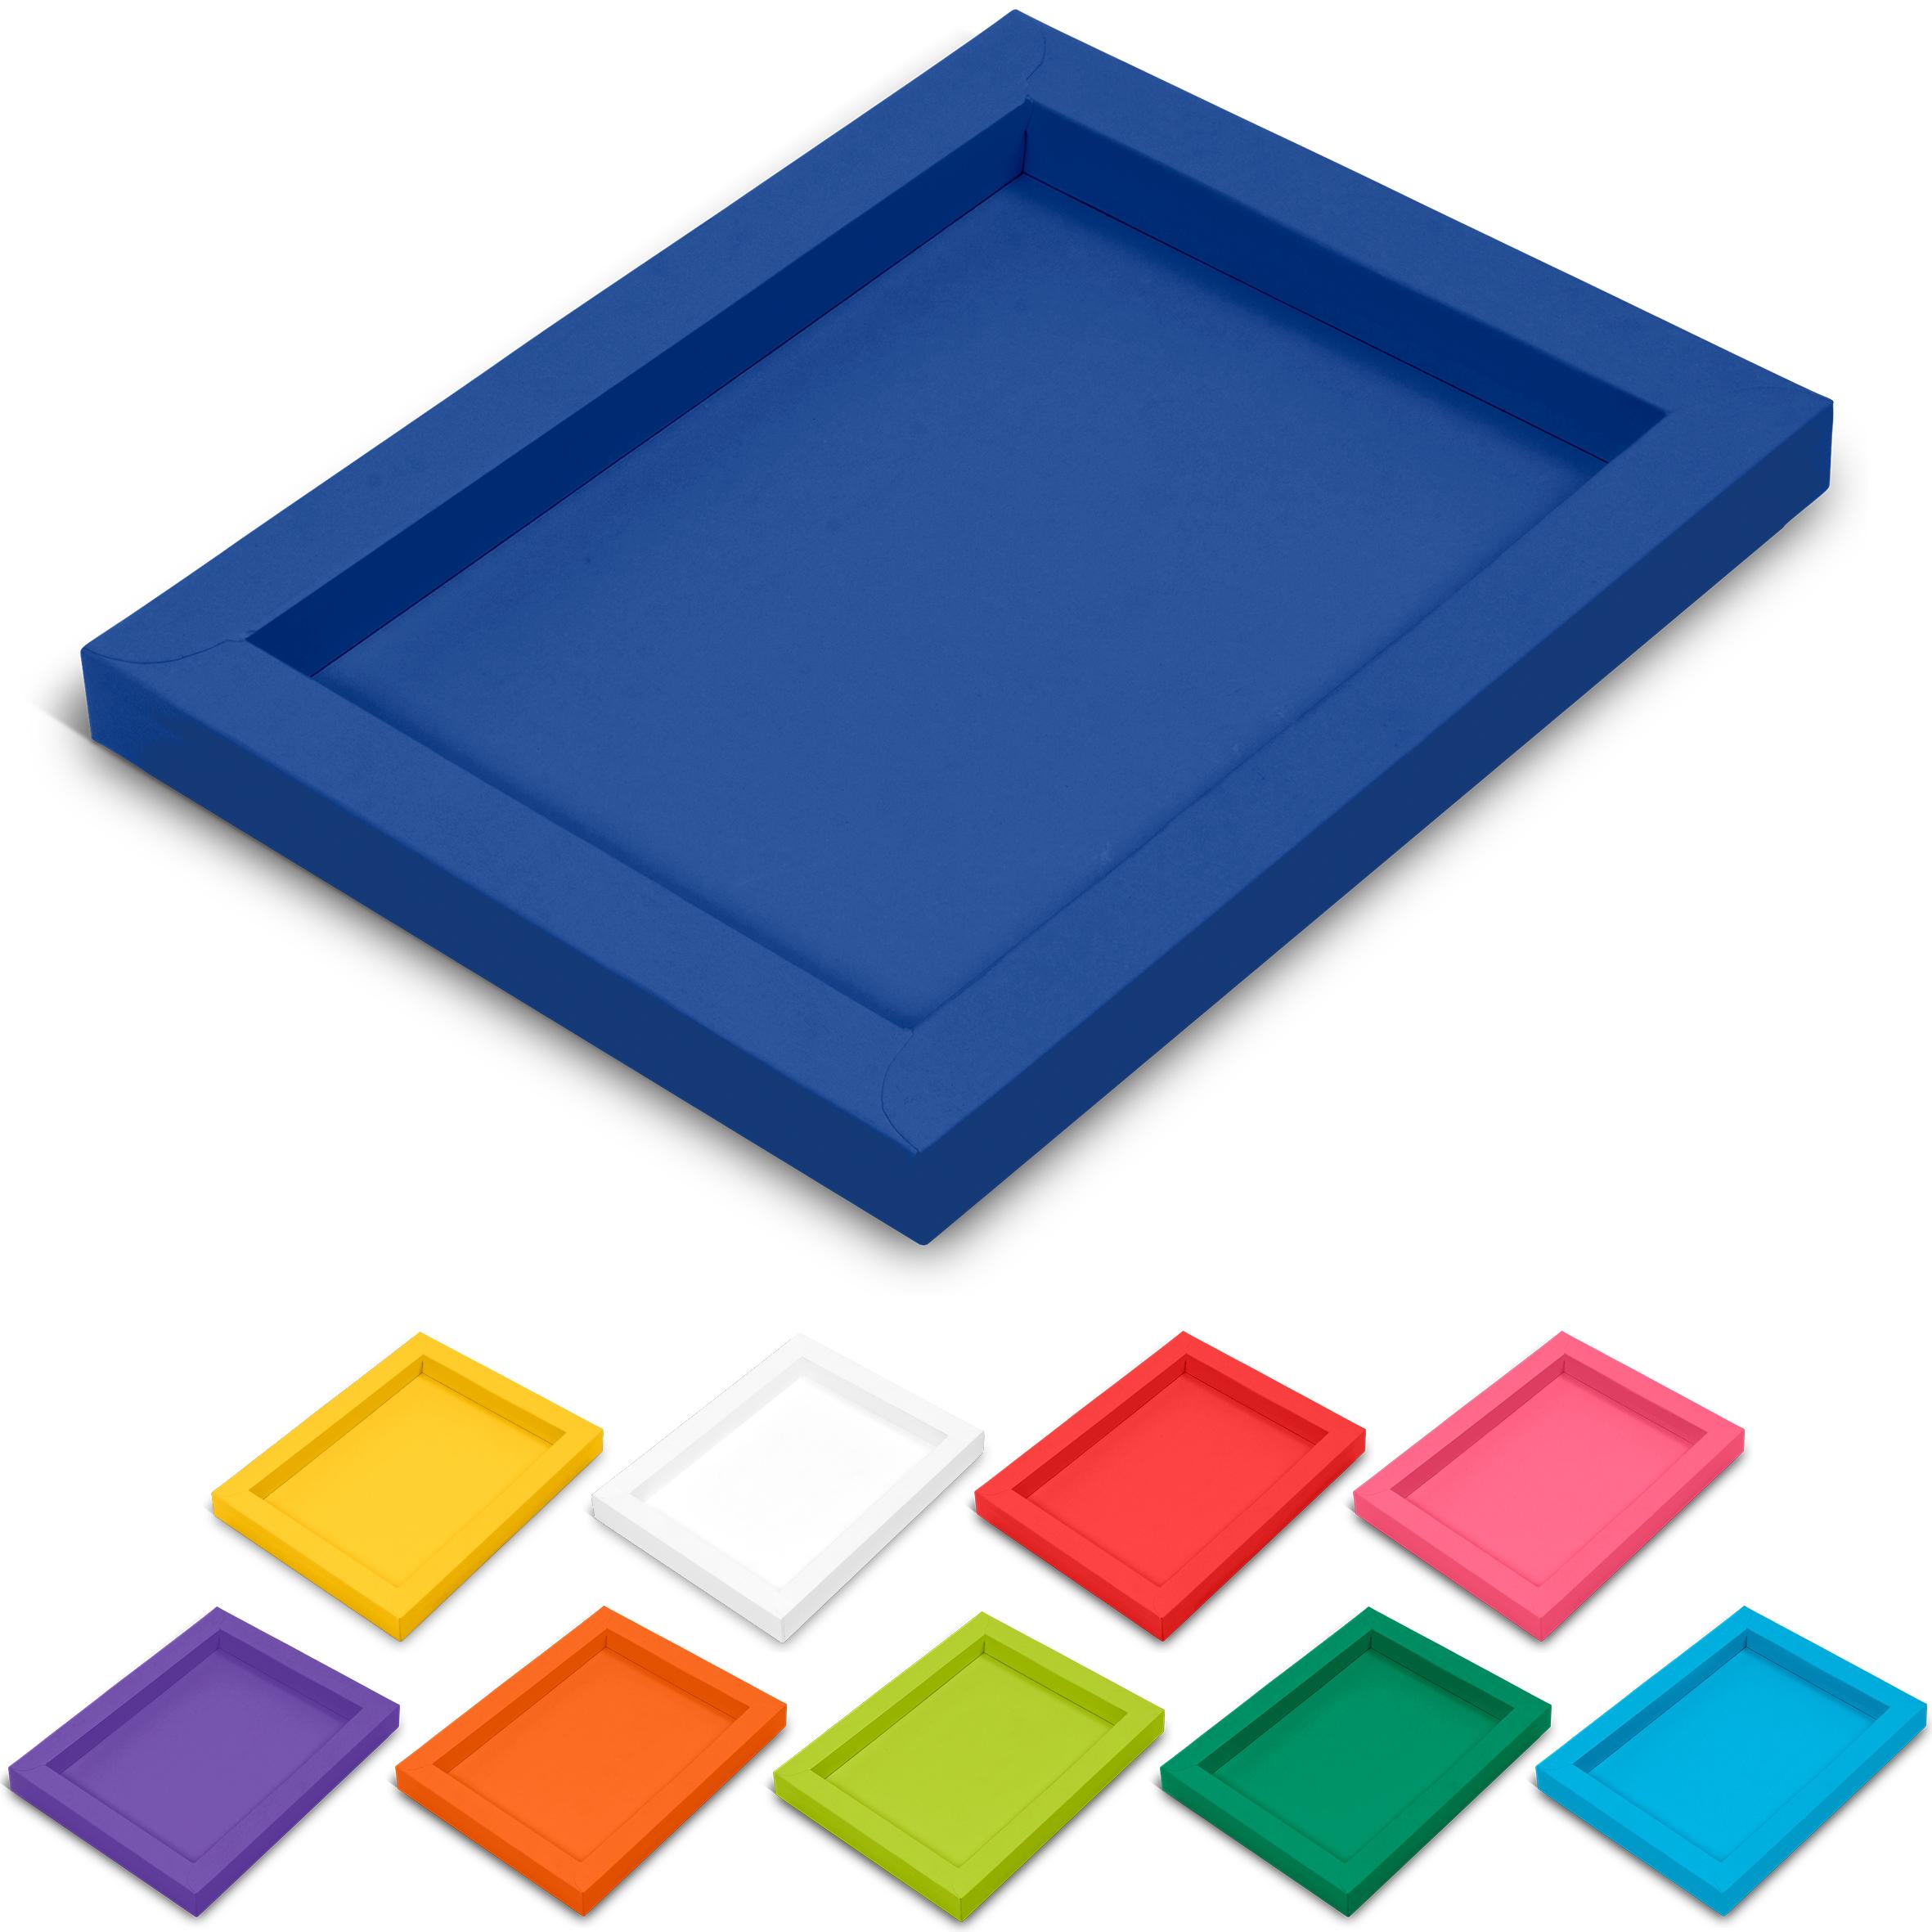 Product: Omega Gift Box